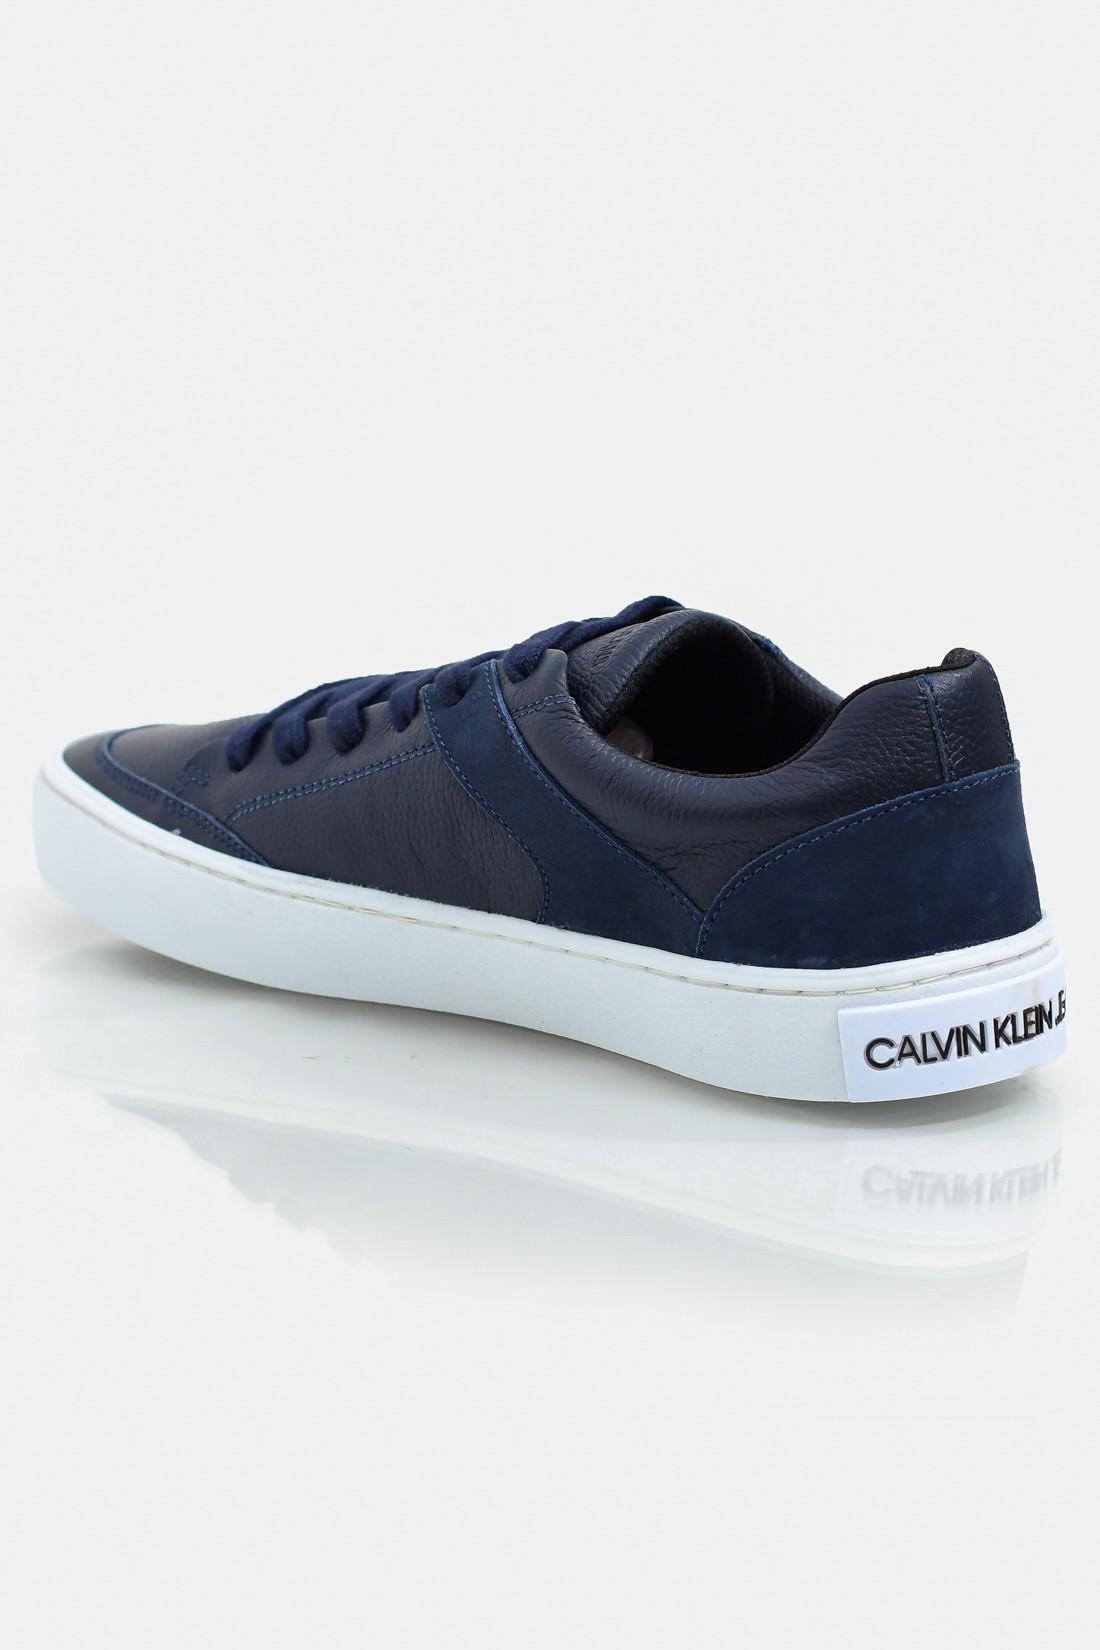 Tenis Casual Calvin Klein Skate Nobuck